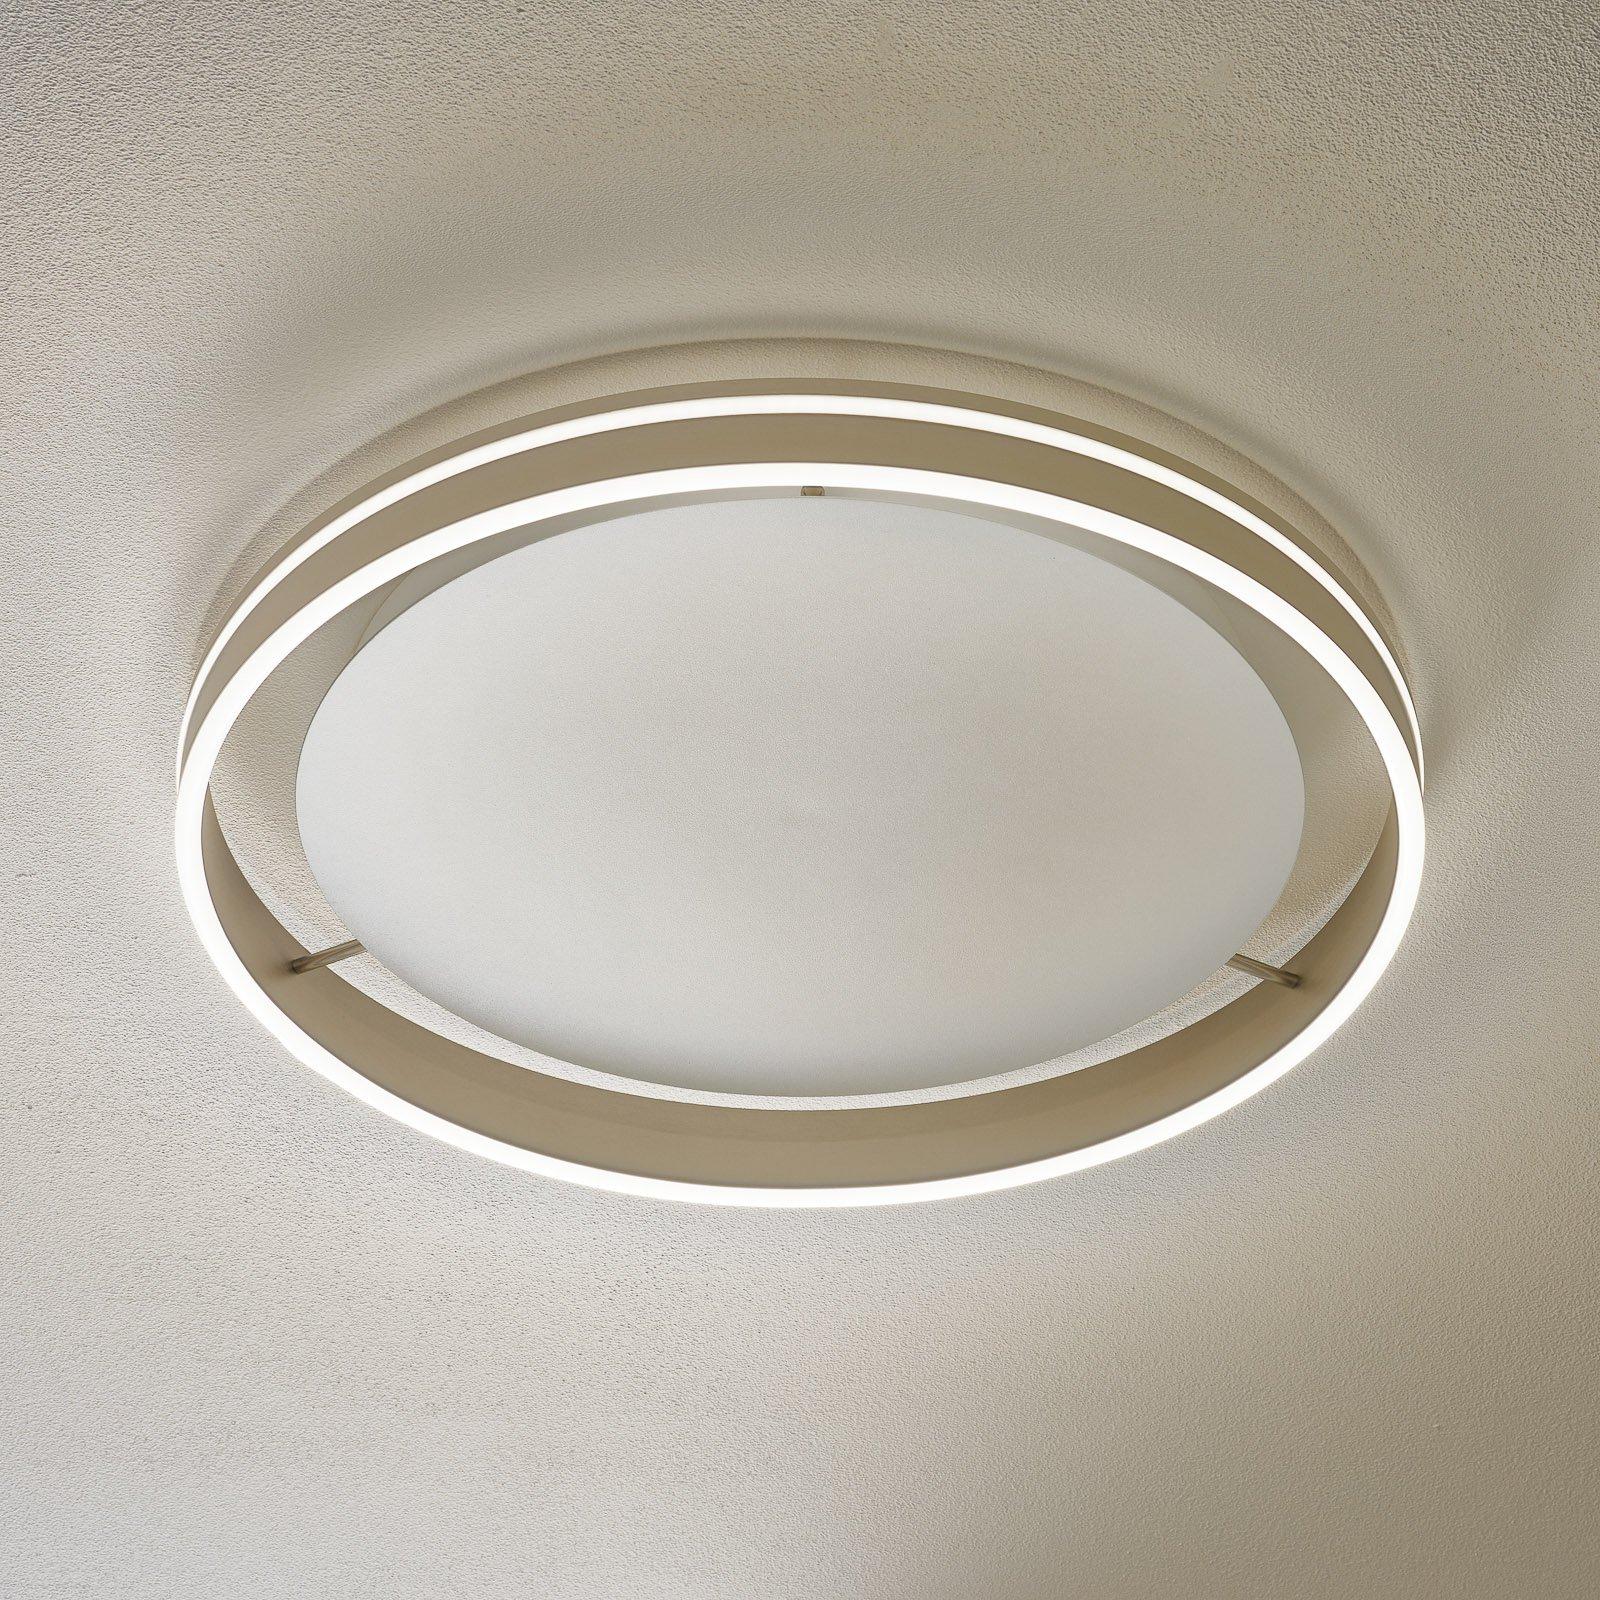 Paul Neuhaus Q-VITO LED-taklampe 59cm stål